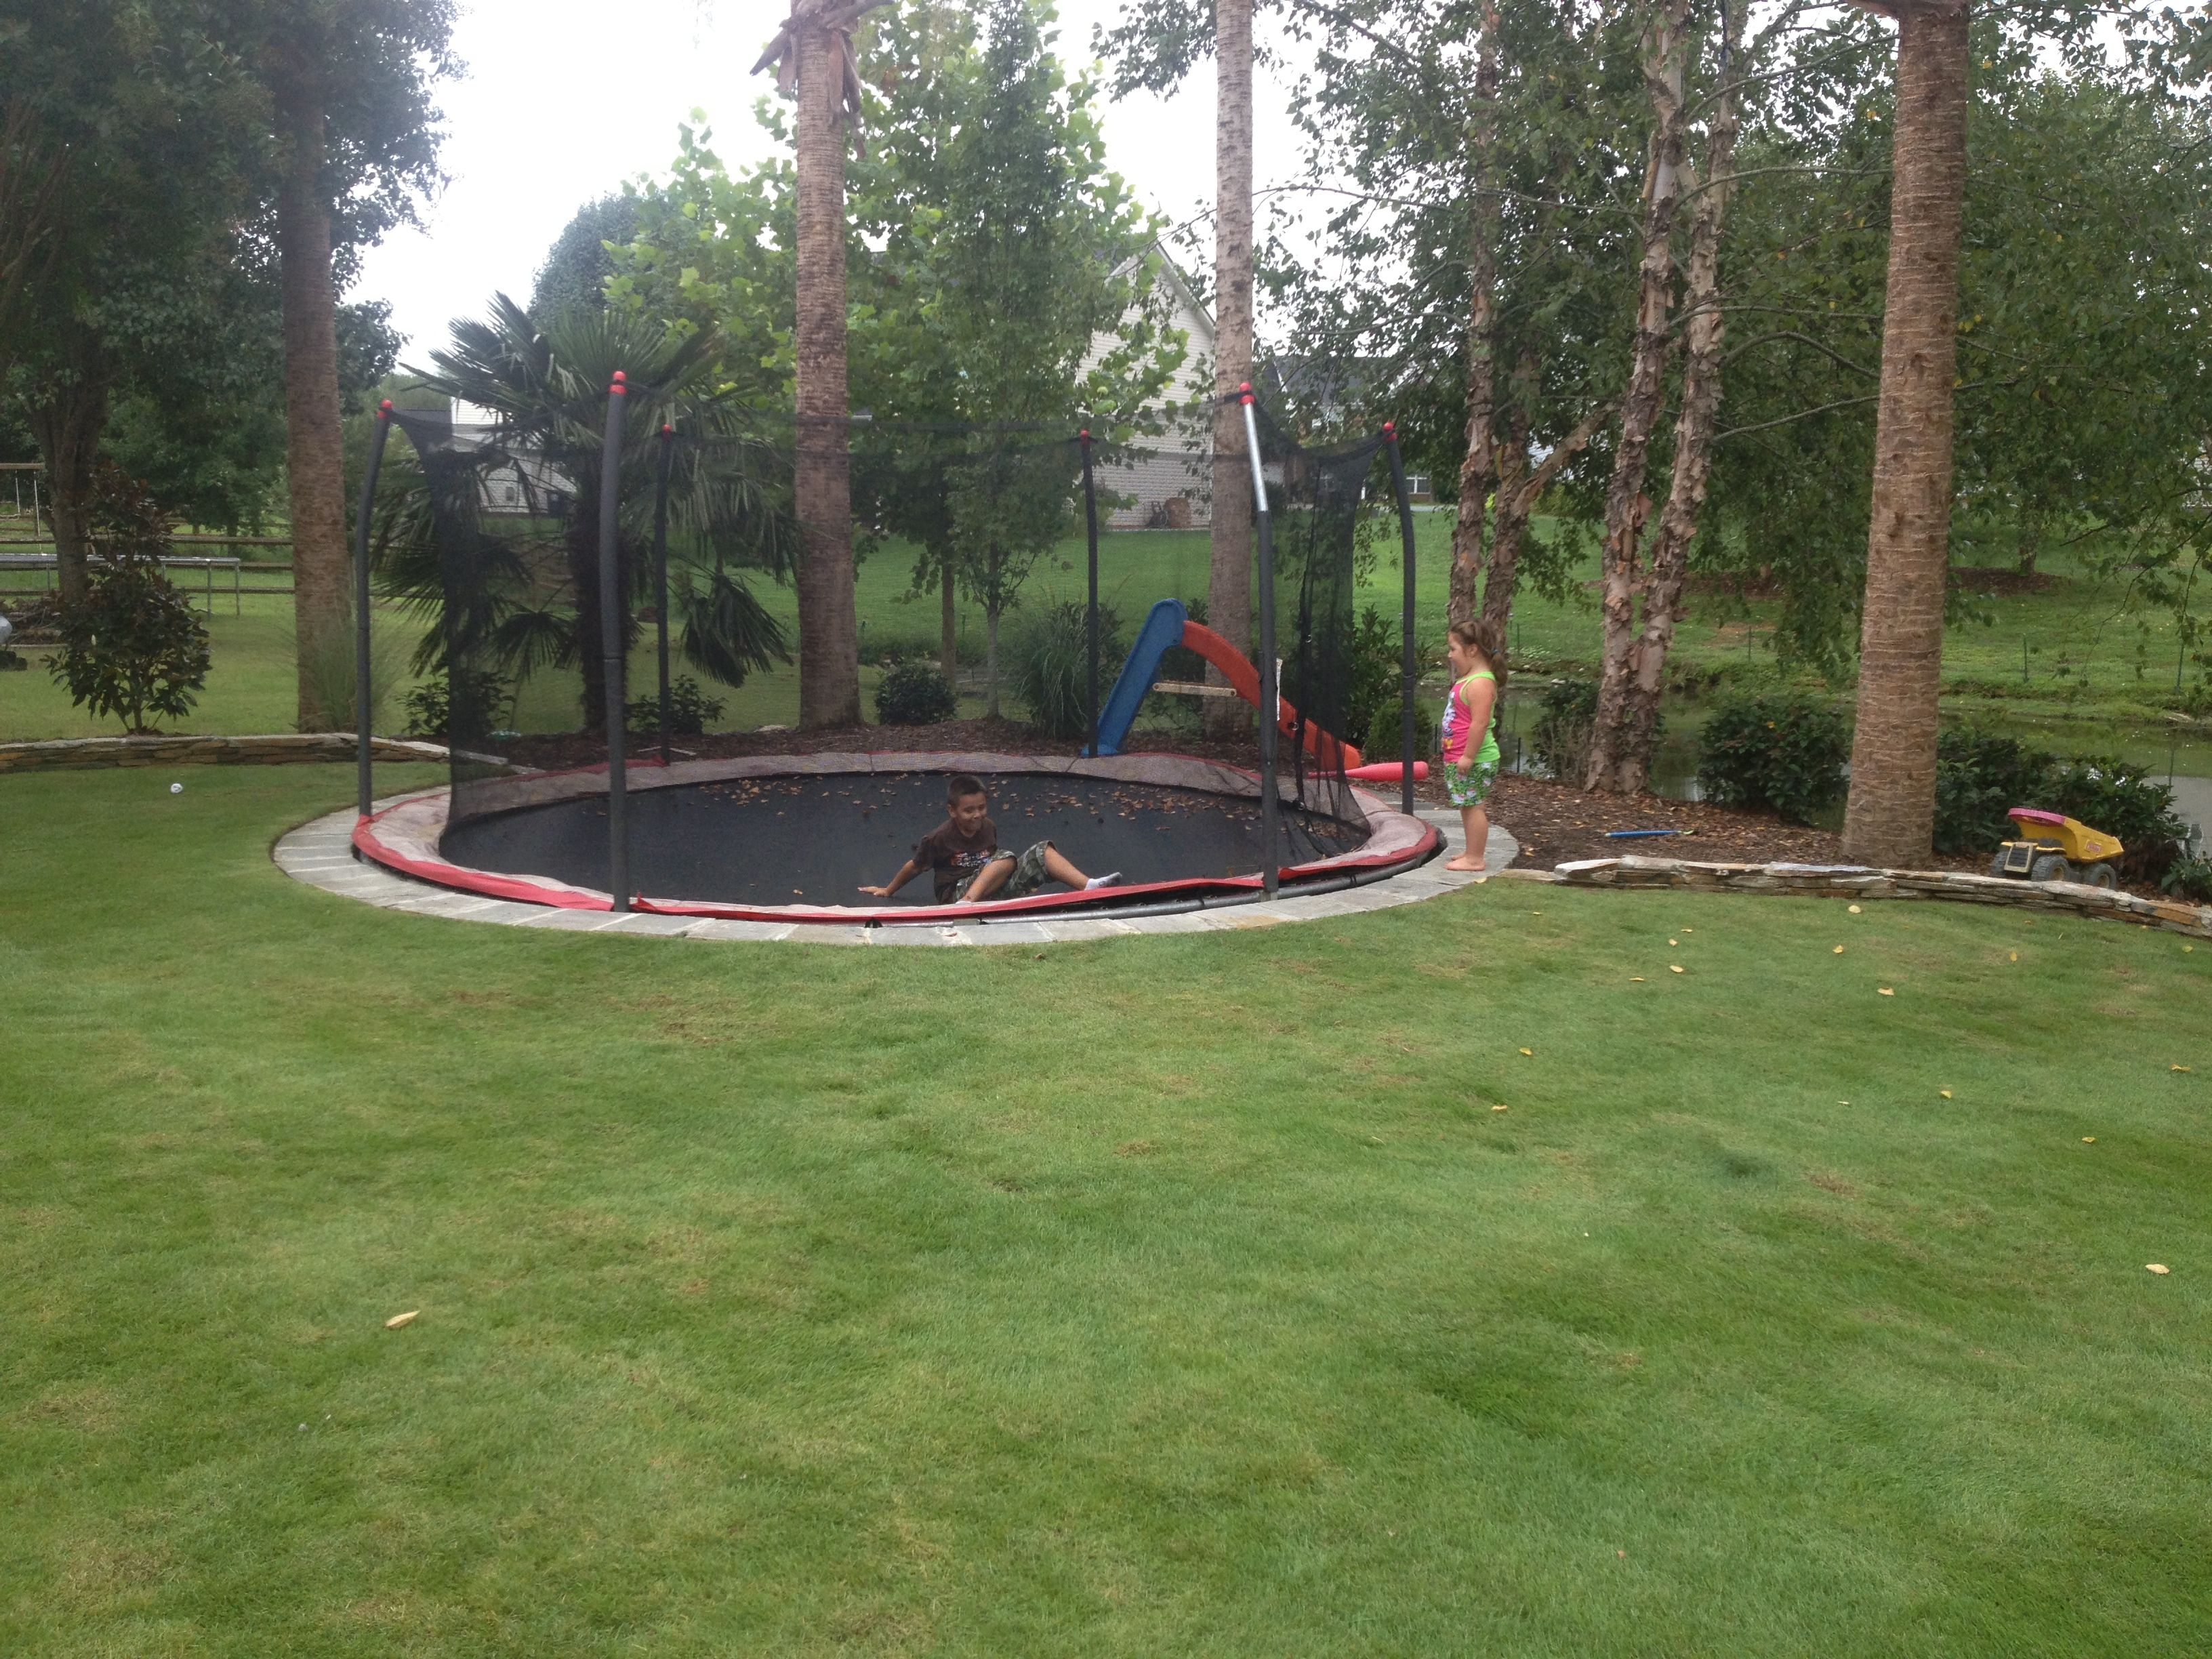 trampoline in the ground zoysia grass lawn backyard landscape